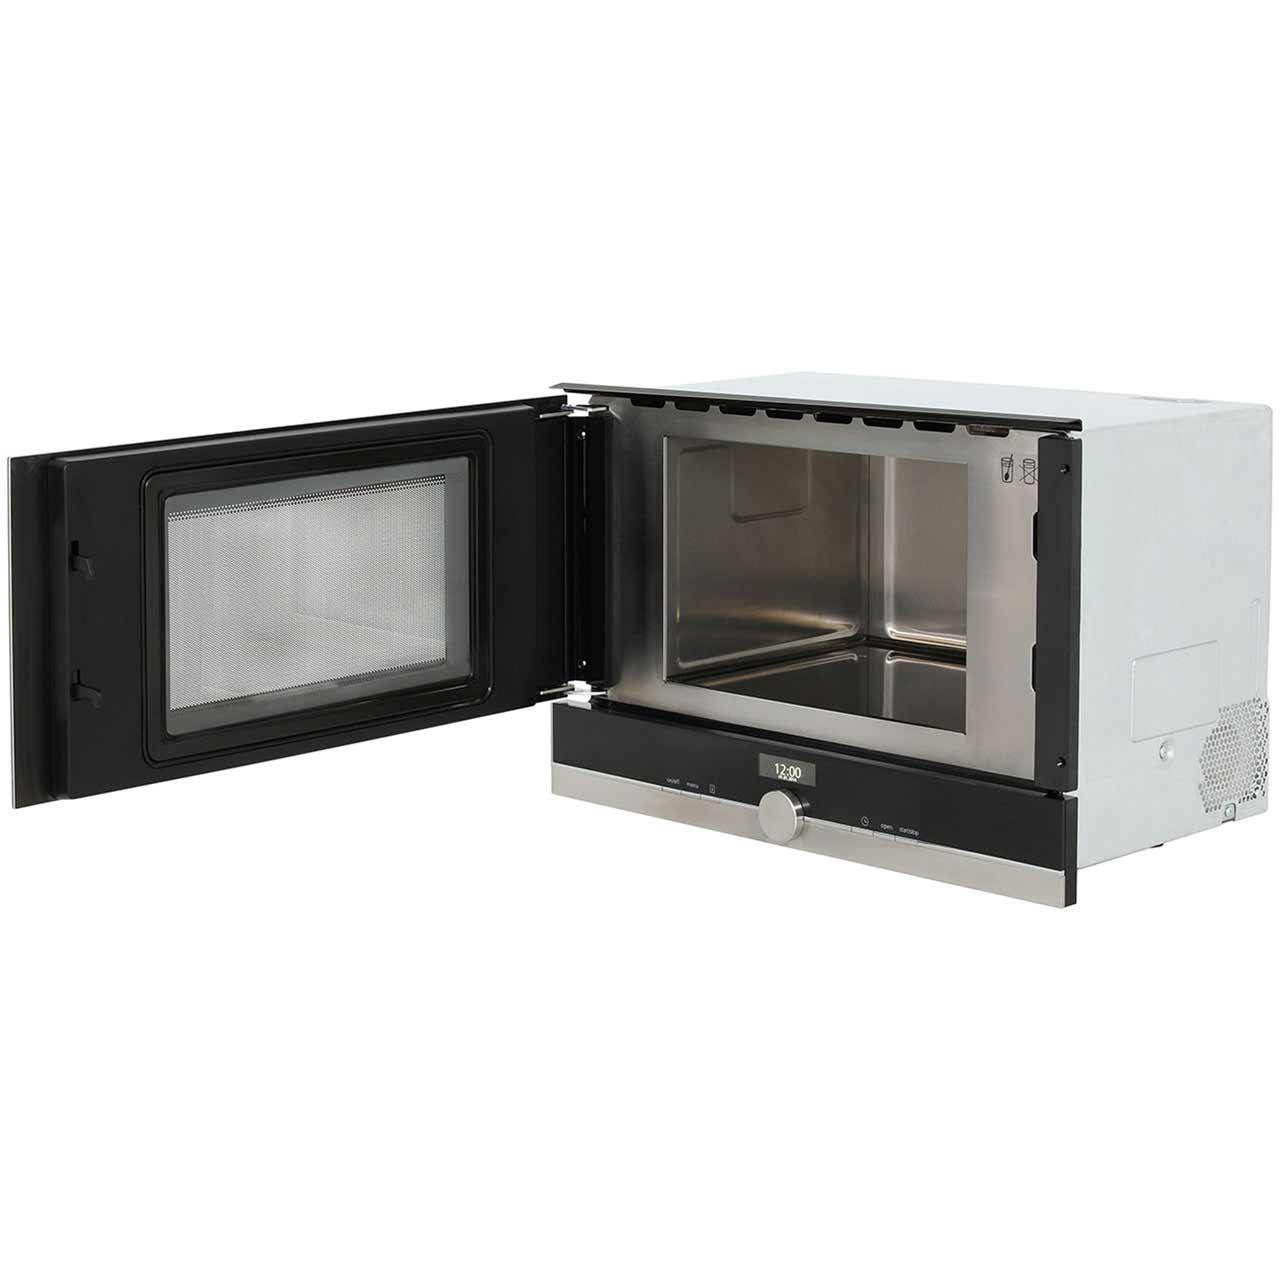 Boots kitchen appliances washing machines fridges more - Rv kitchen appliances ...